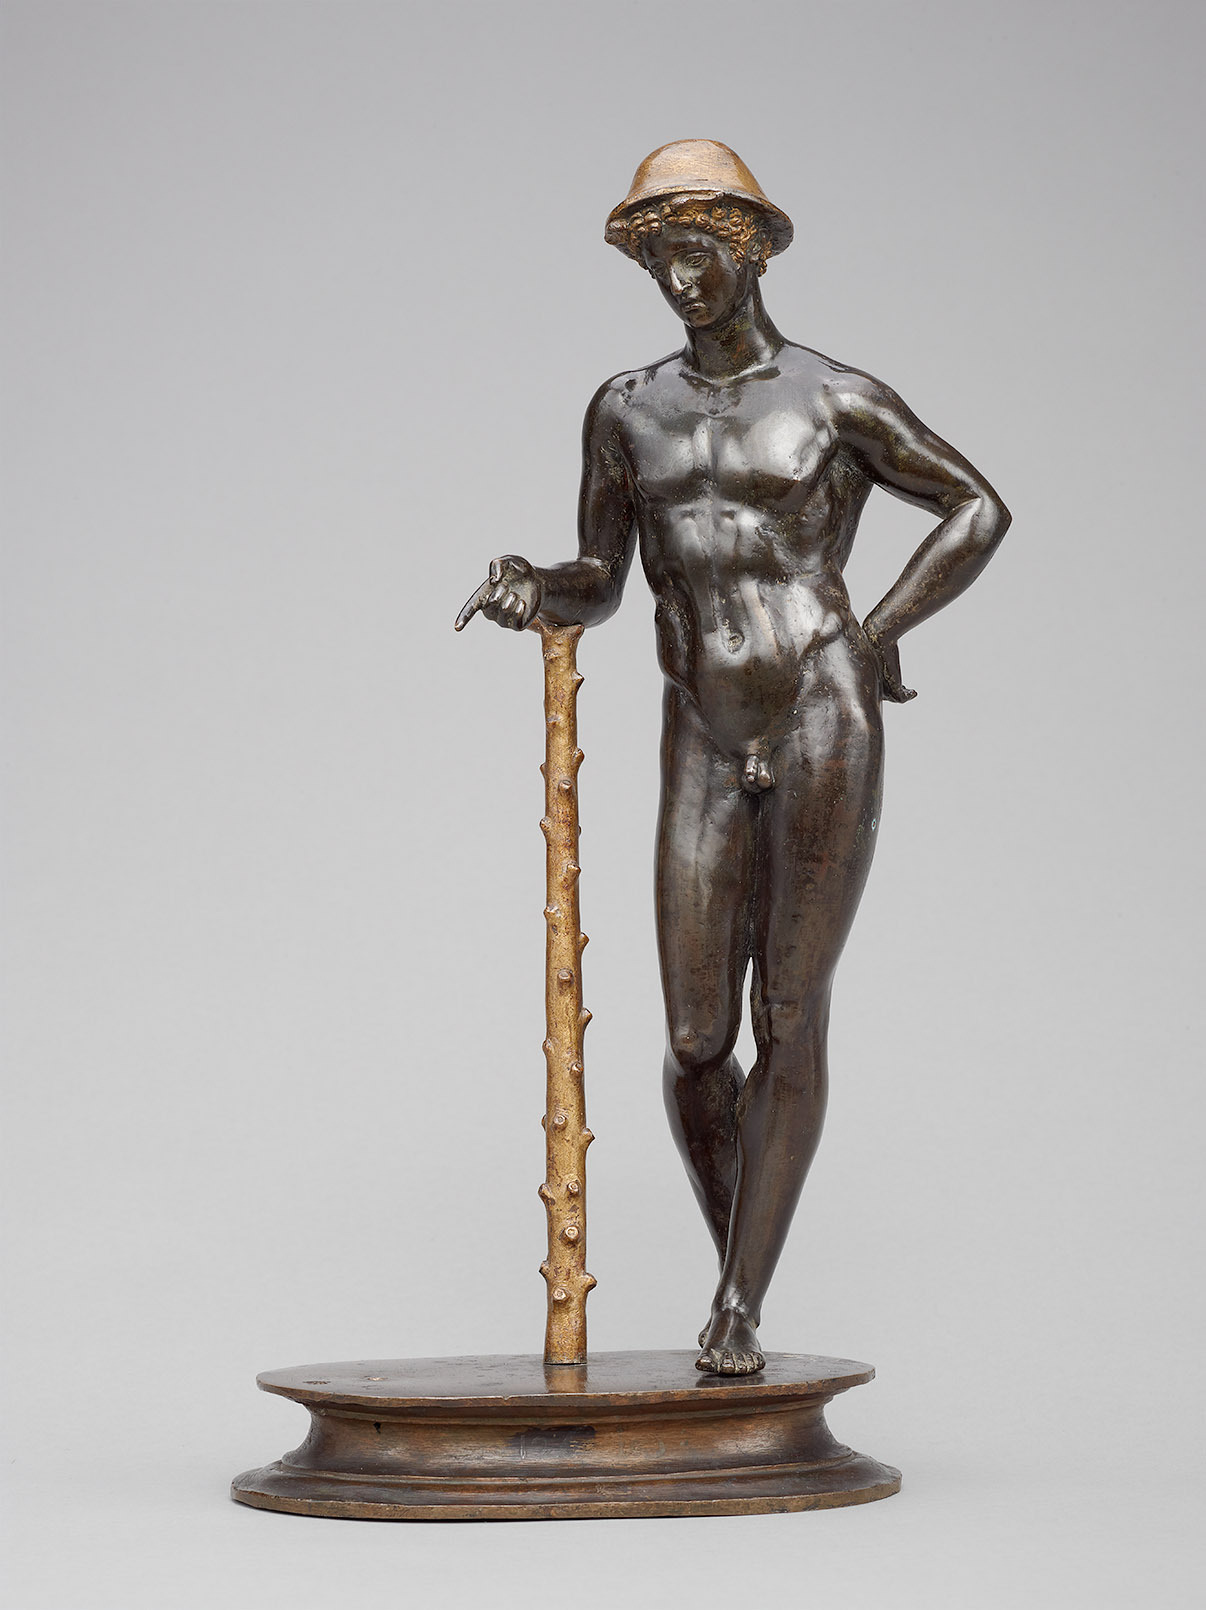 Merkur unterrichtet Cupido (Fragment) von Pier Jacopo Alari de Bonacolsi, gen. Antico